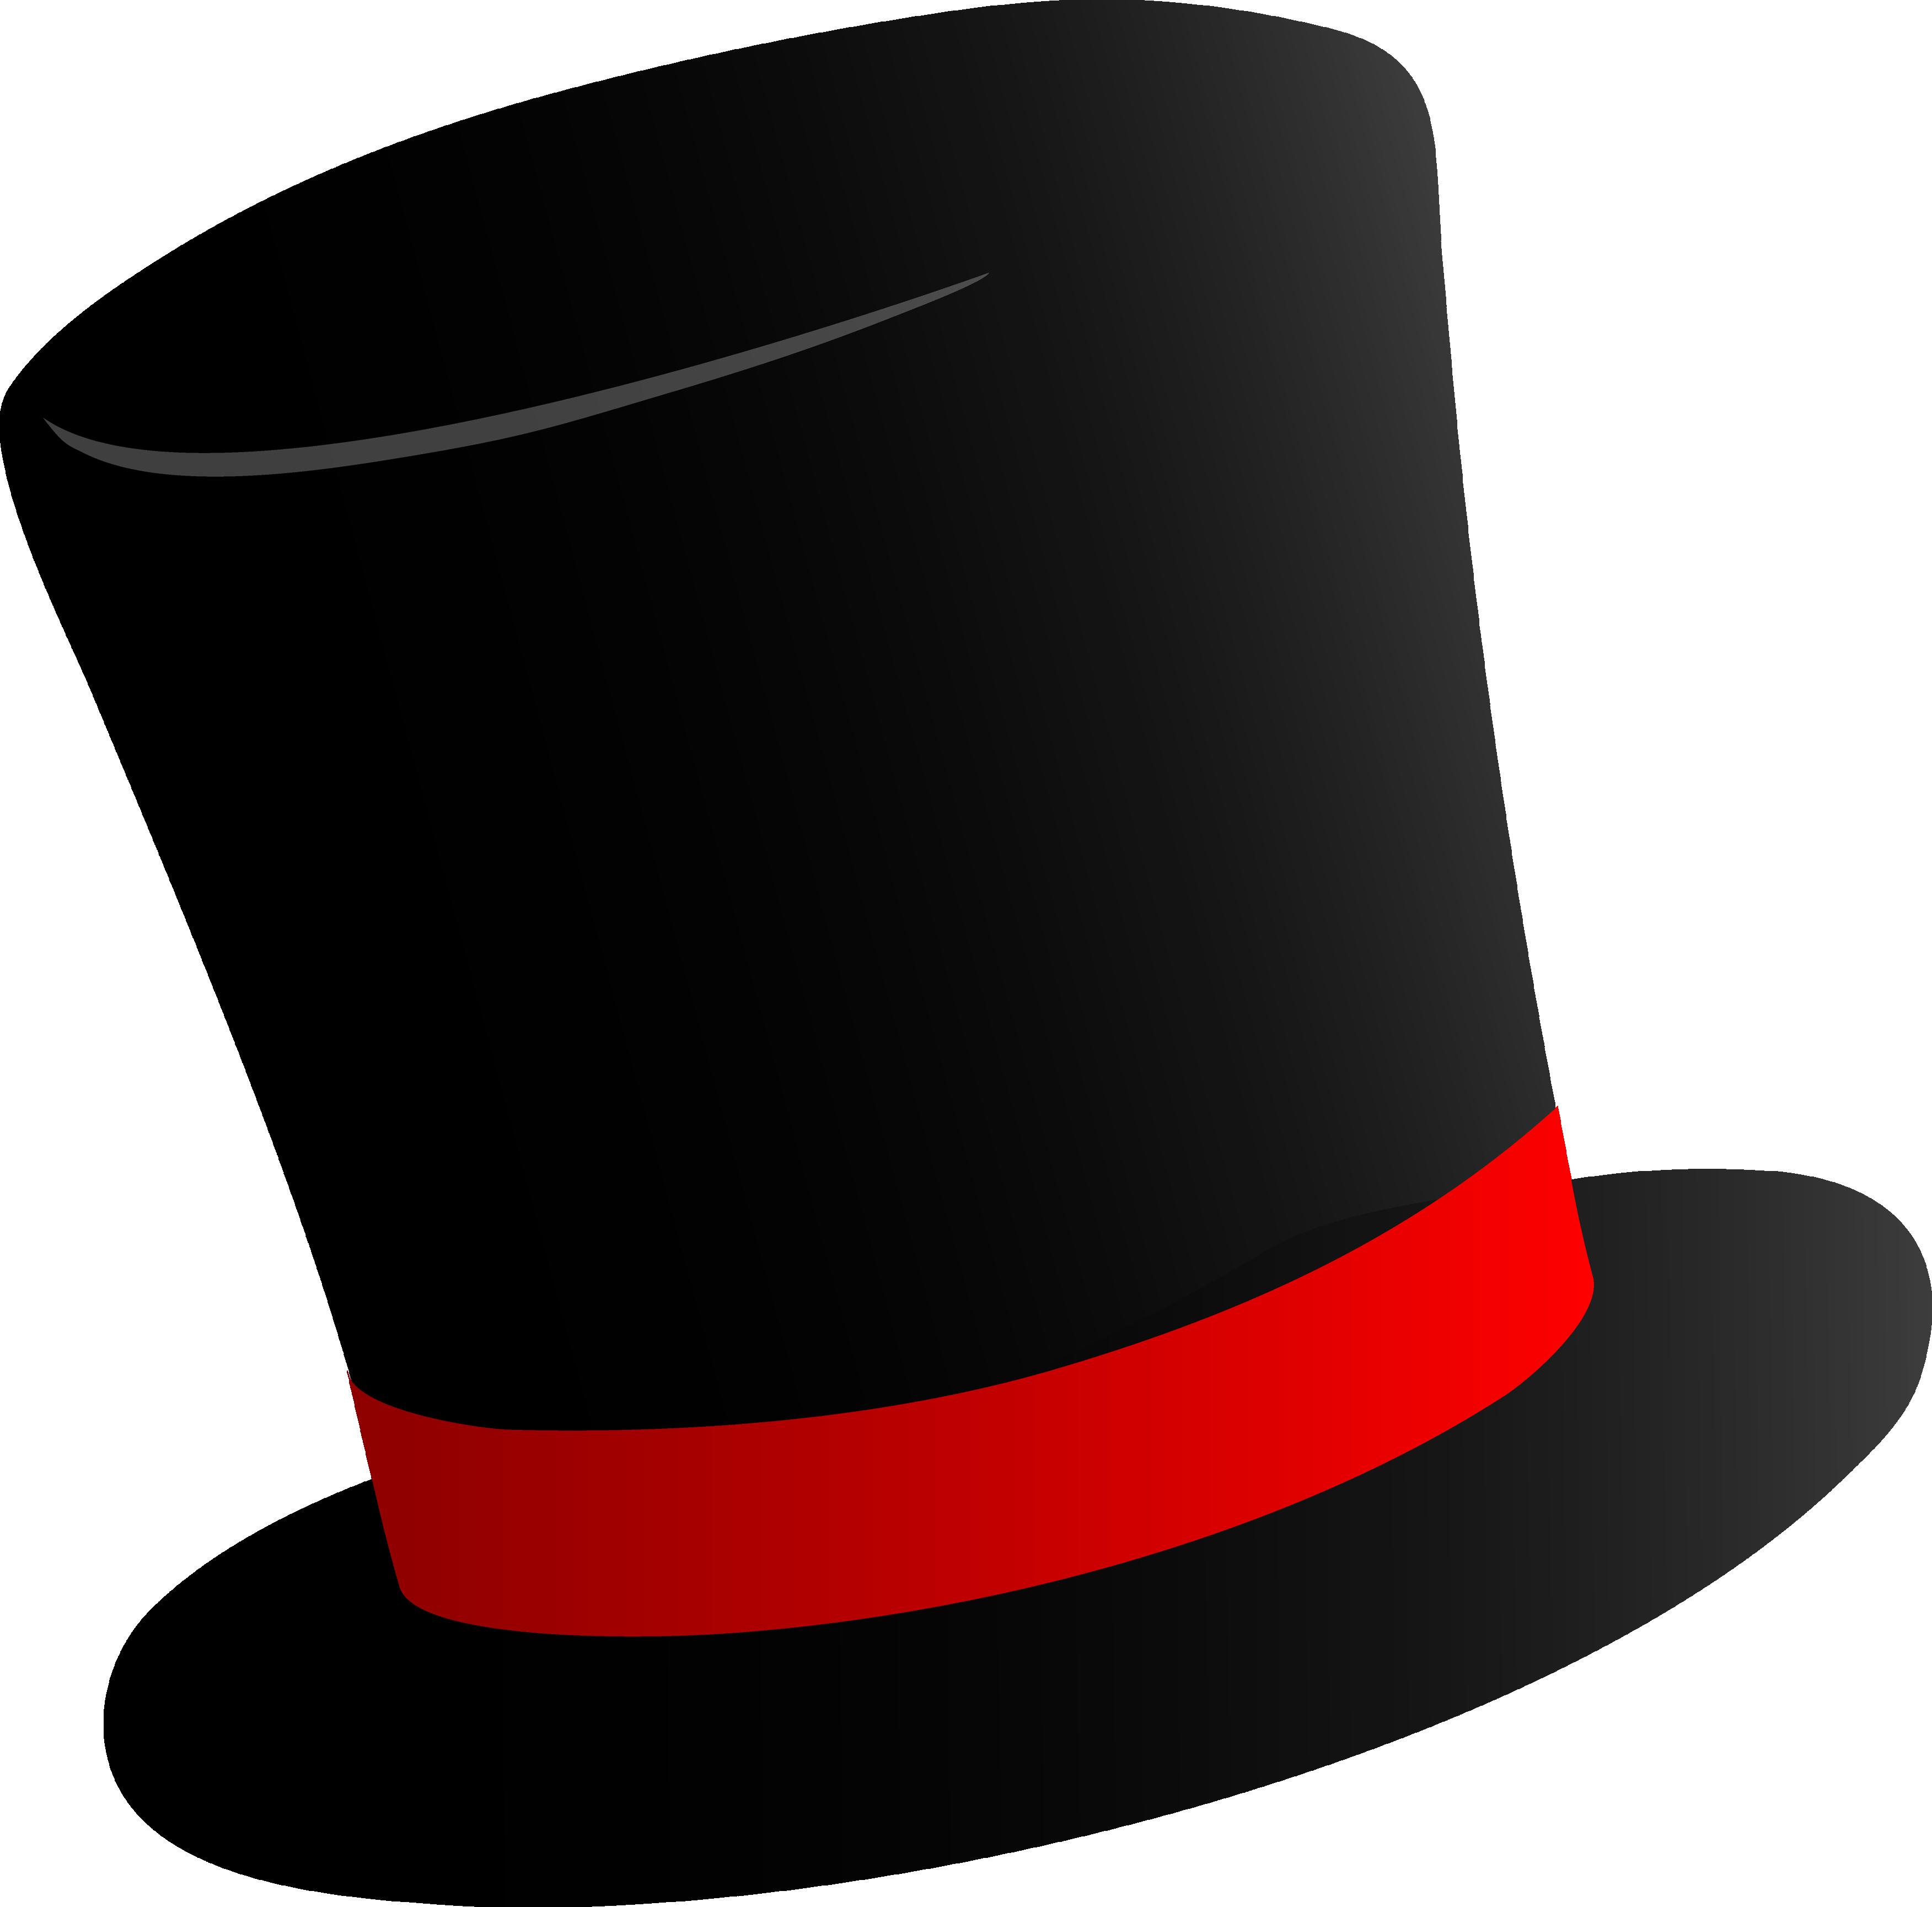 Fashion clipart fancy hat. Png transparent images free